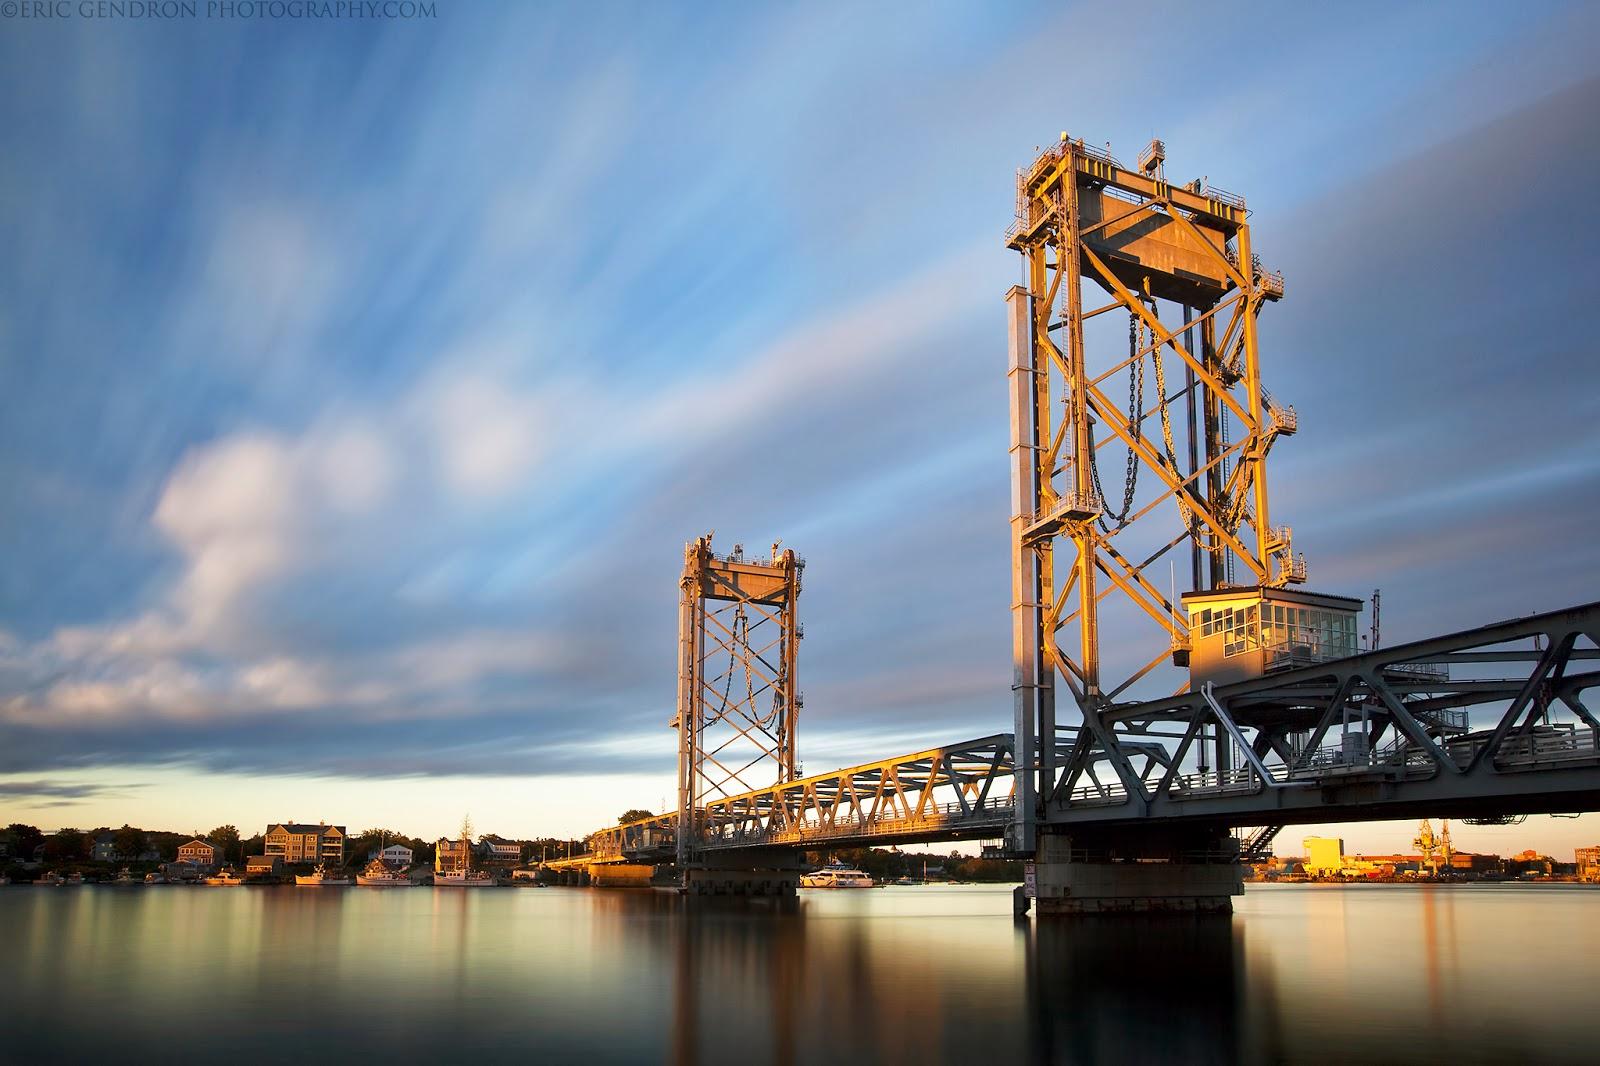 New Memorial Bridge in portsmouth nh